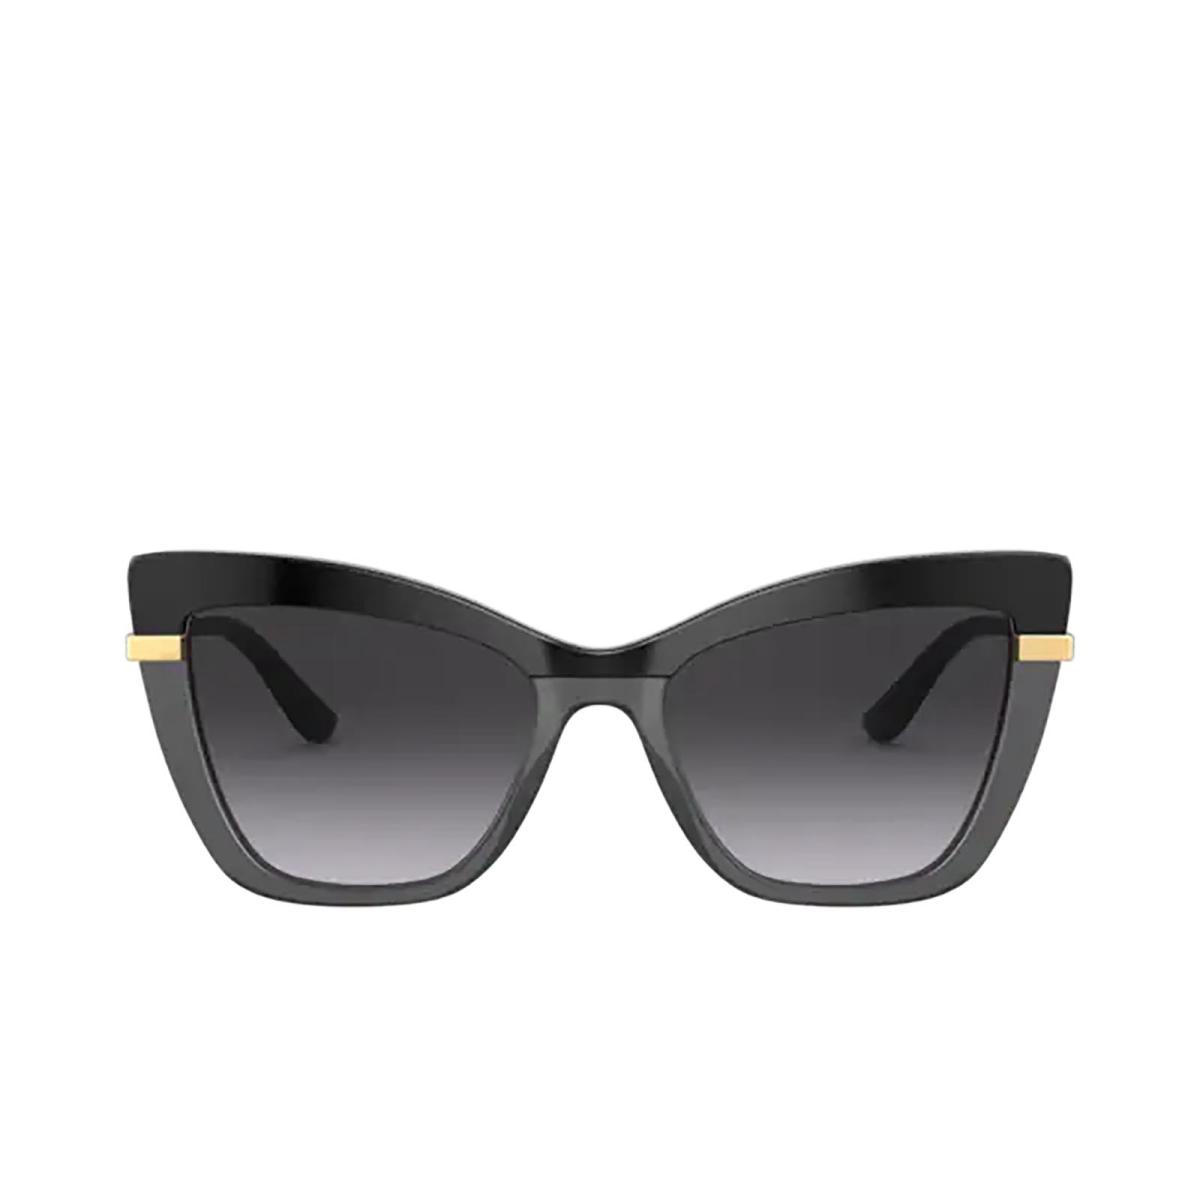 Dolce & Gabbana® Cat-eye Sunglasses: DG4374 color Black On Transparent Black 32468G.